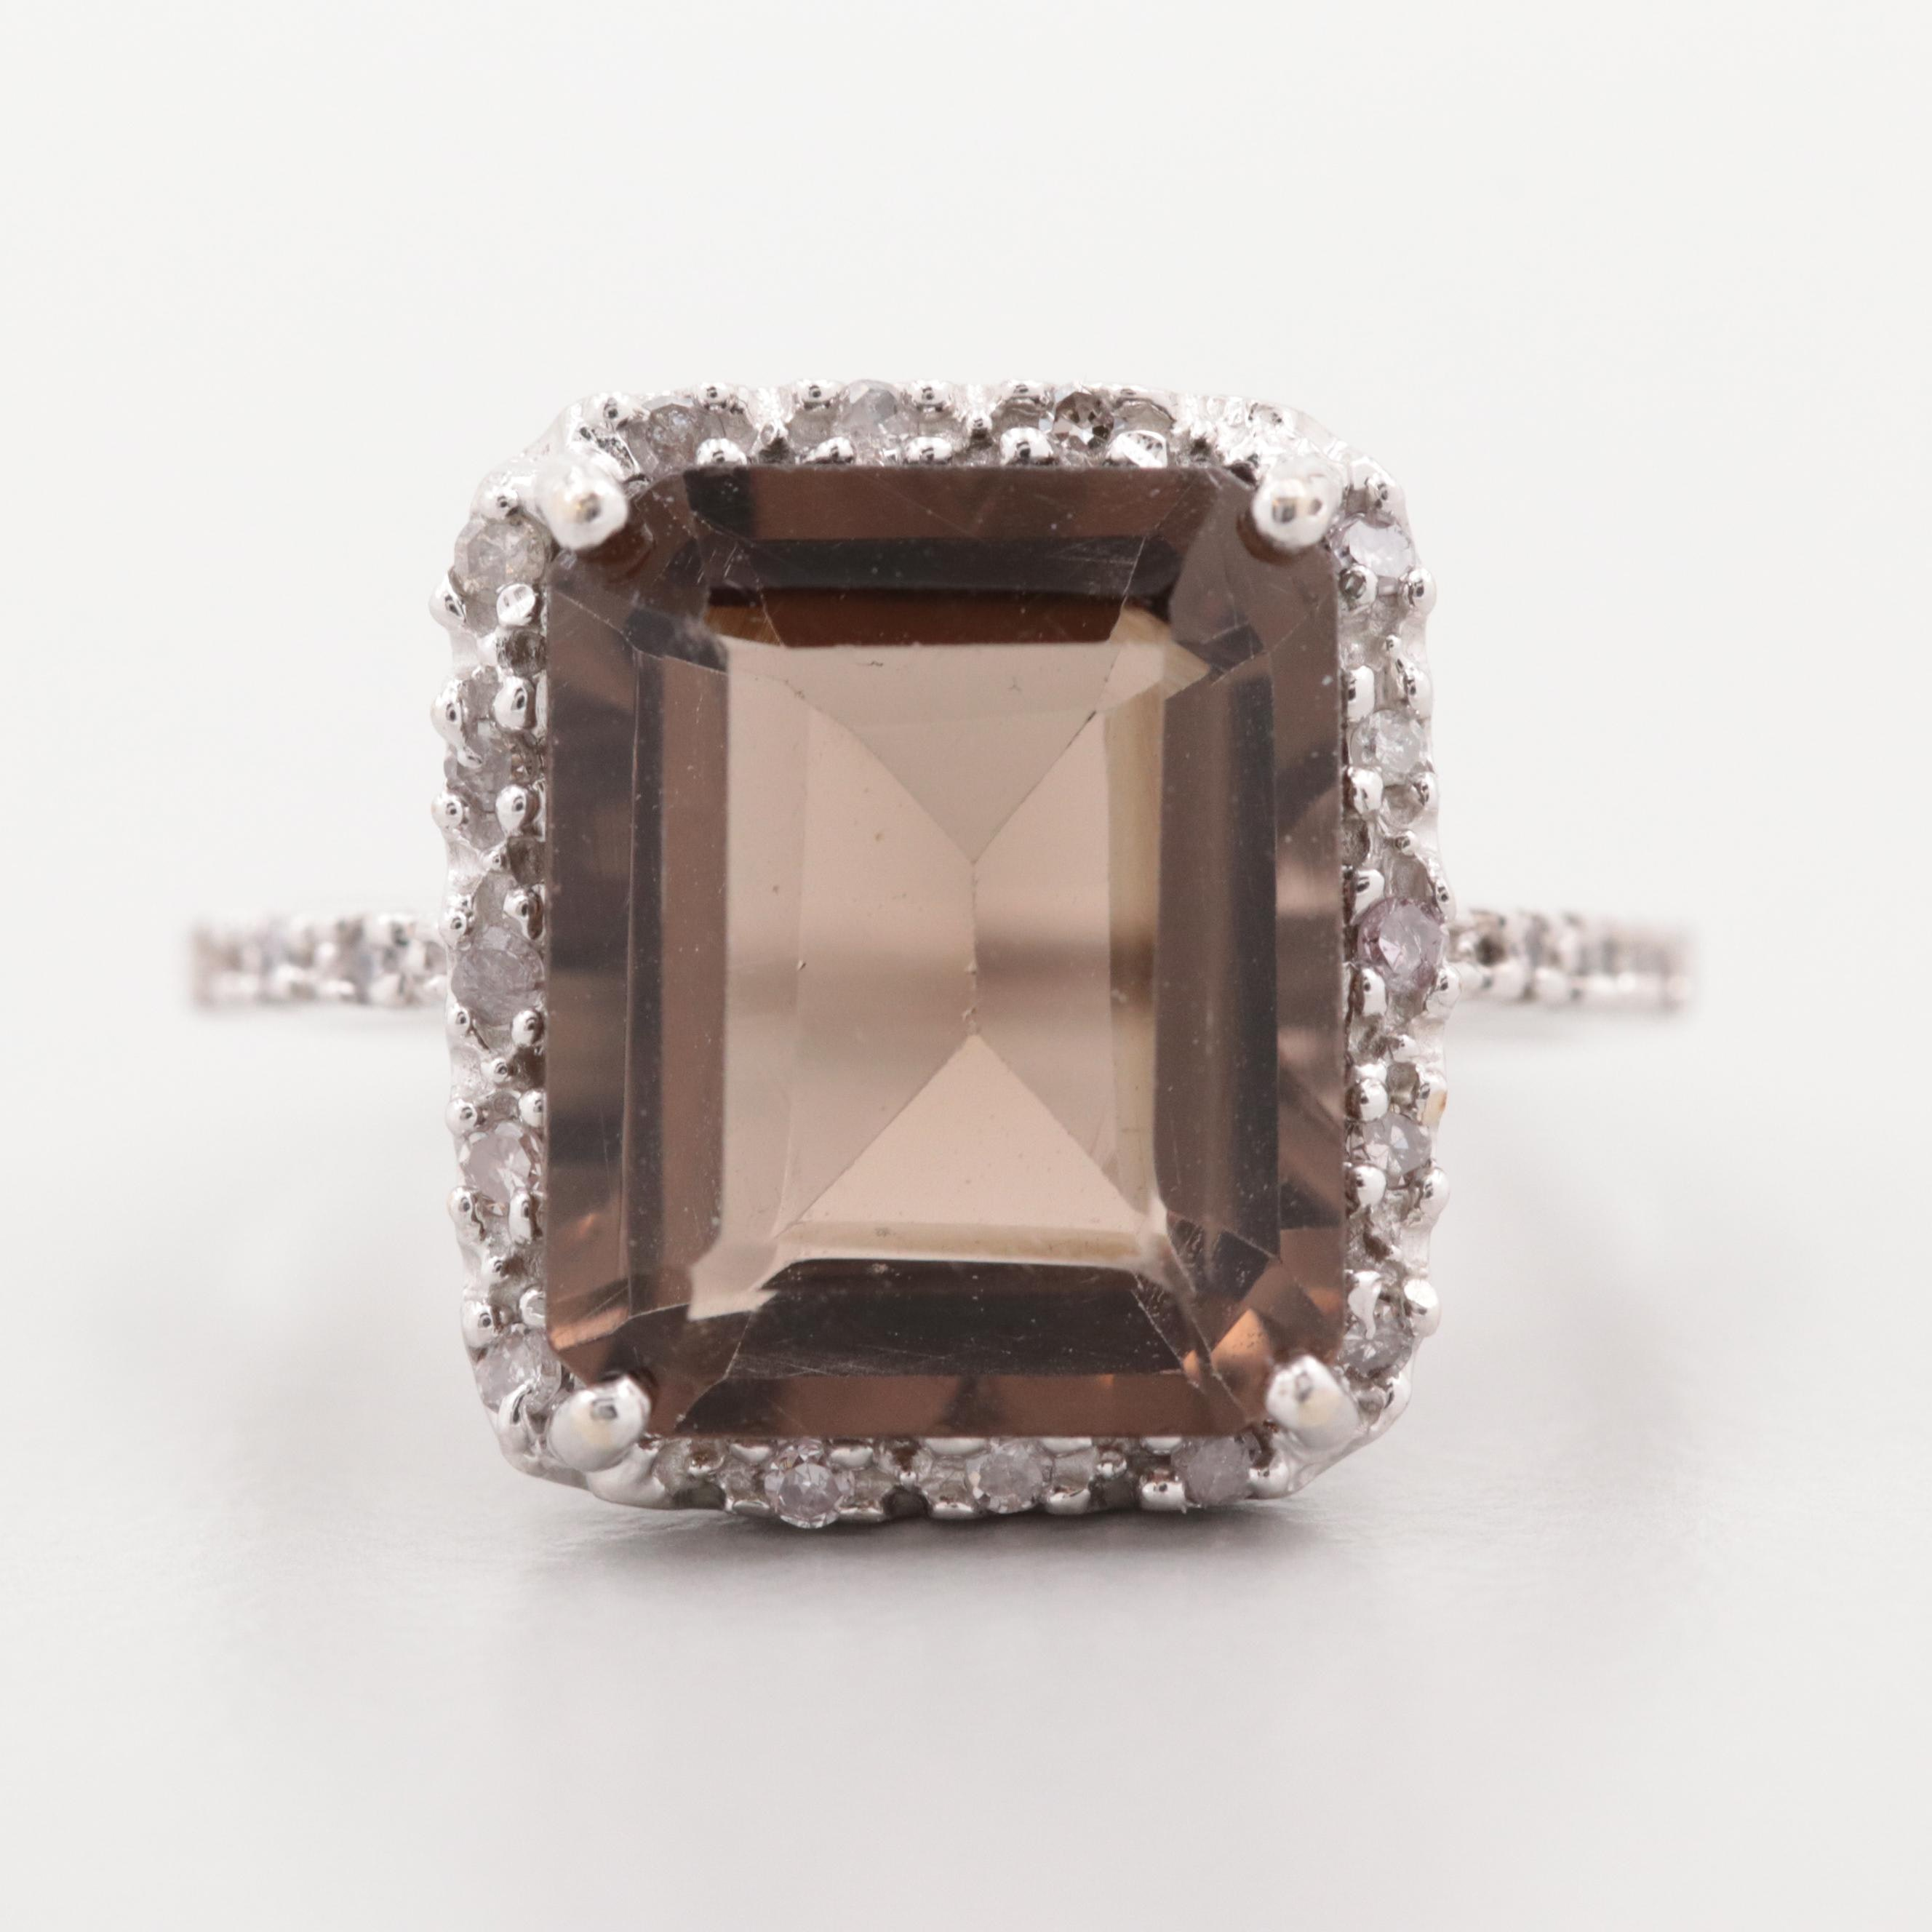 Fine Jewelry, Decor and More